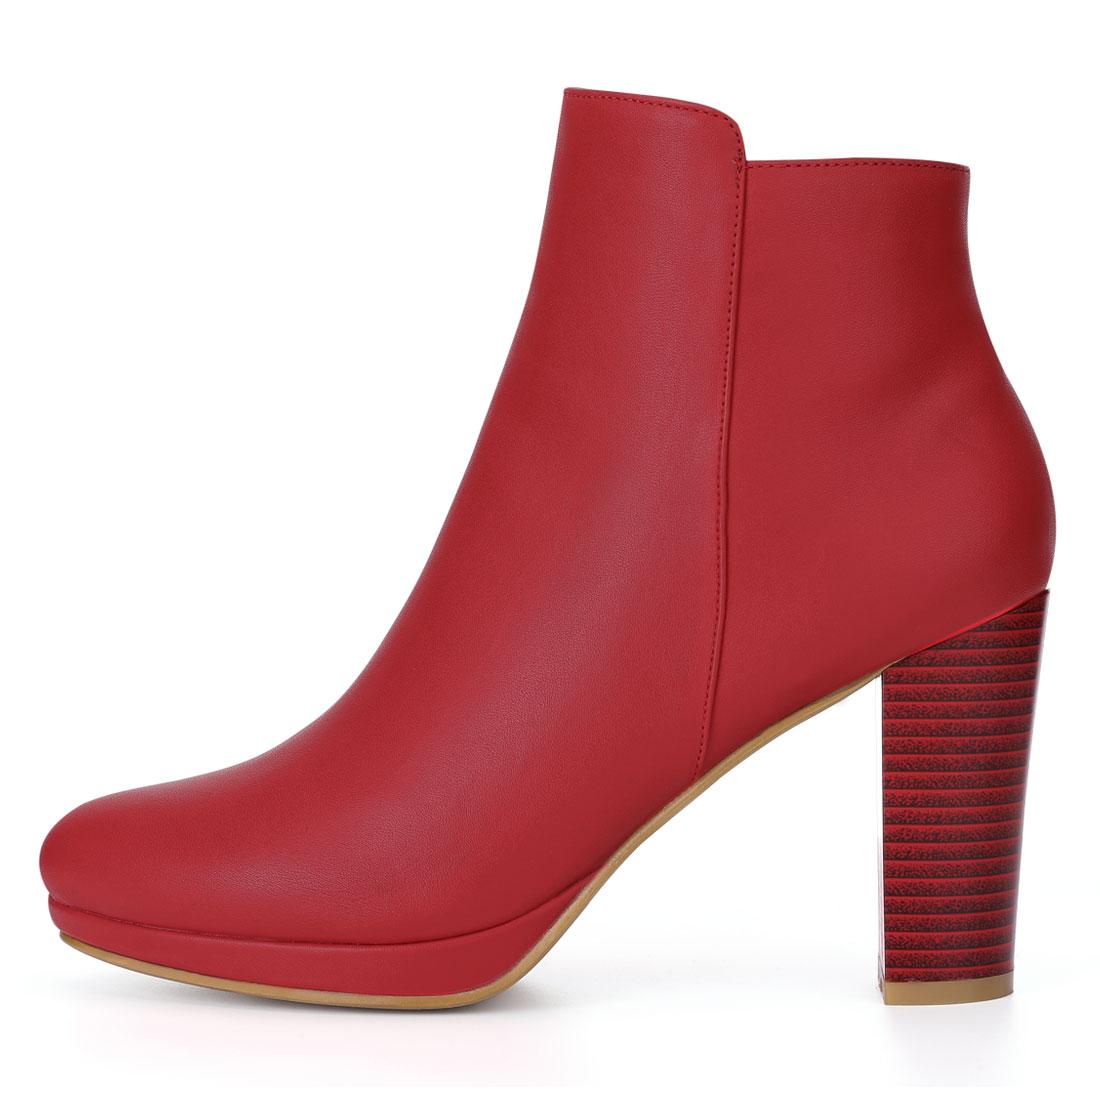 Allegra K Women Round Toe Chunky Heel Platform Ankle Boots Red US 6